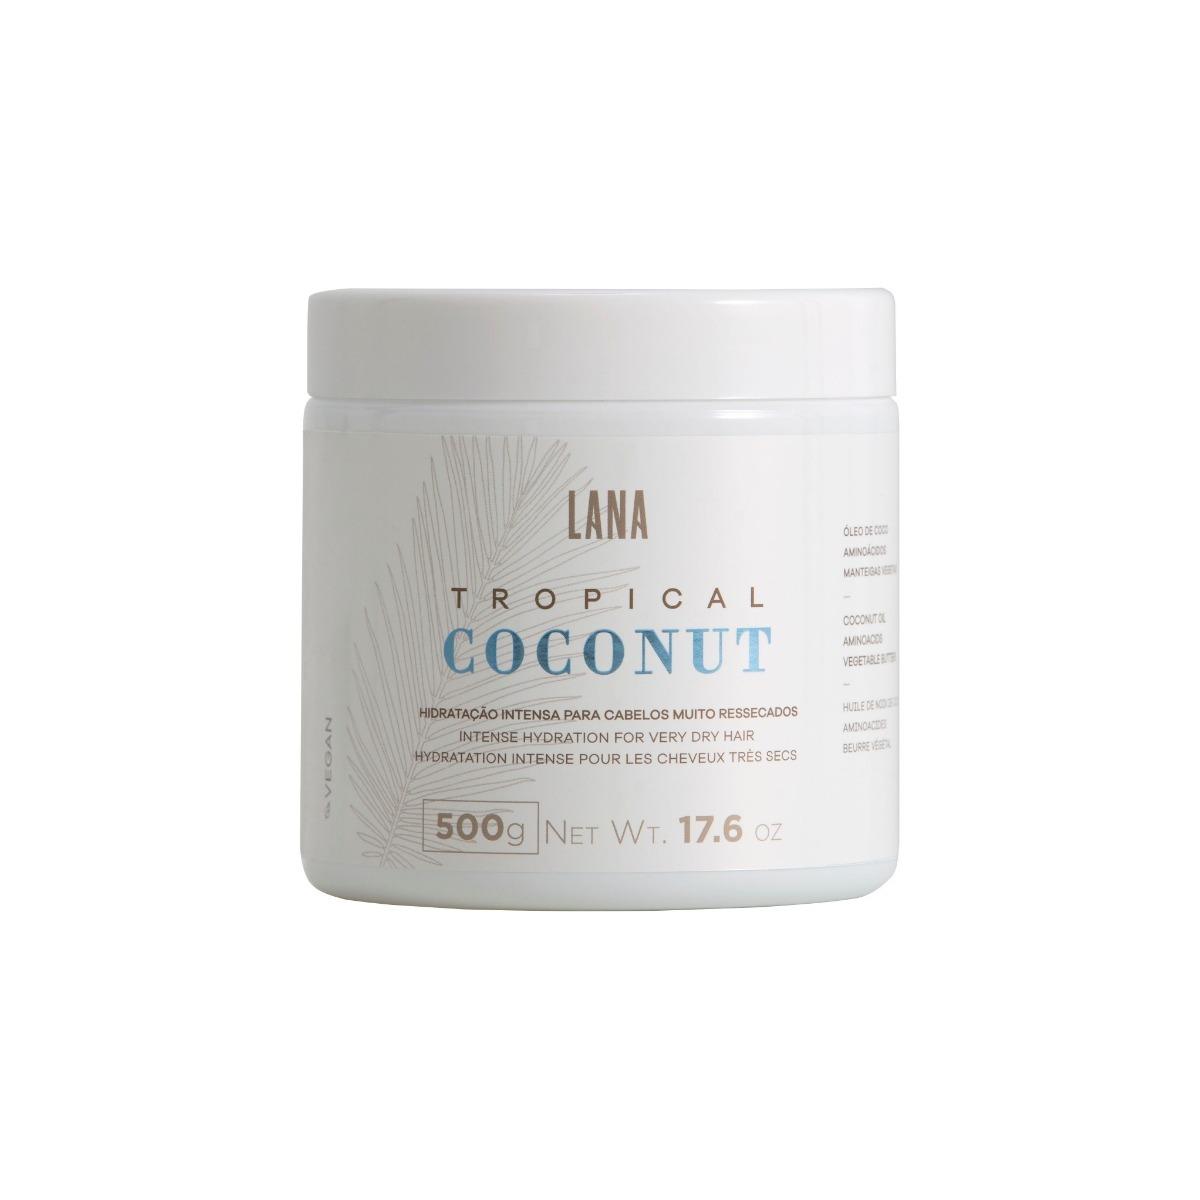 Lana Brasiles - Máscara Tropical Coconut Hidratação Intensa 500g